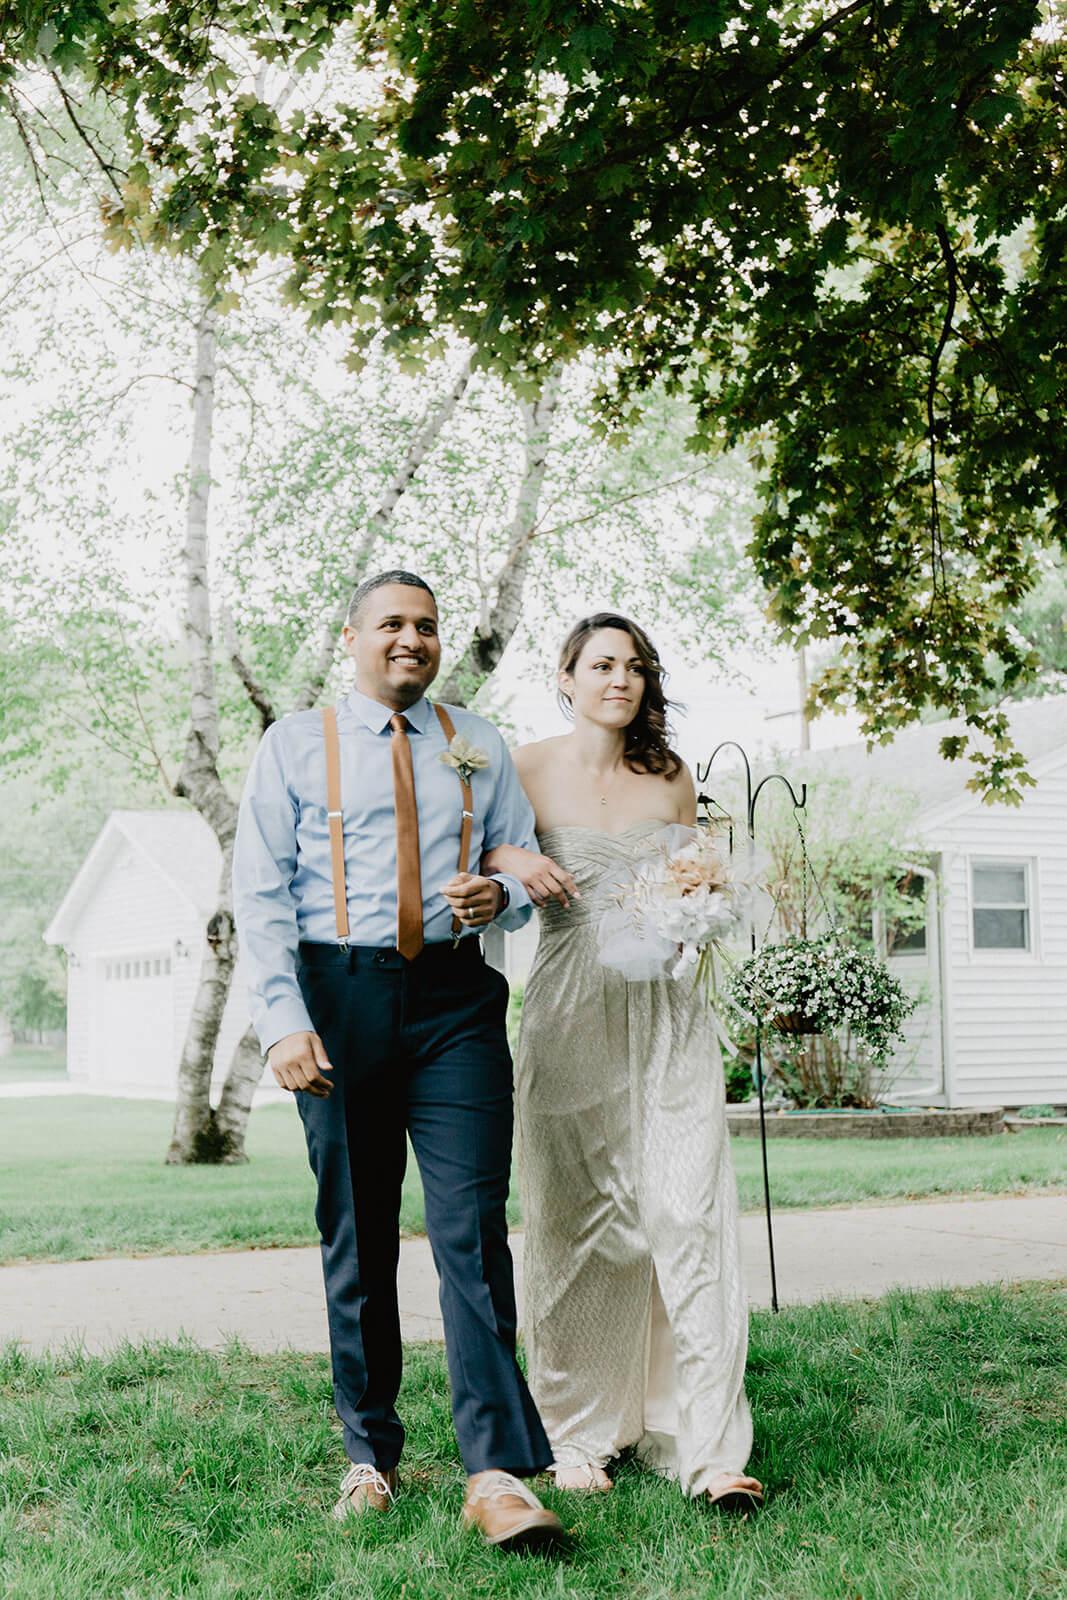 Alex + Lisi :: backyard Minnesota wedding :: Mads Lizotte photography :: Sixpence Events16.jpg